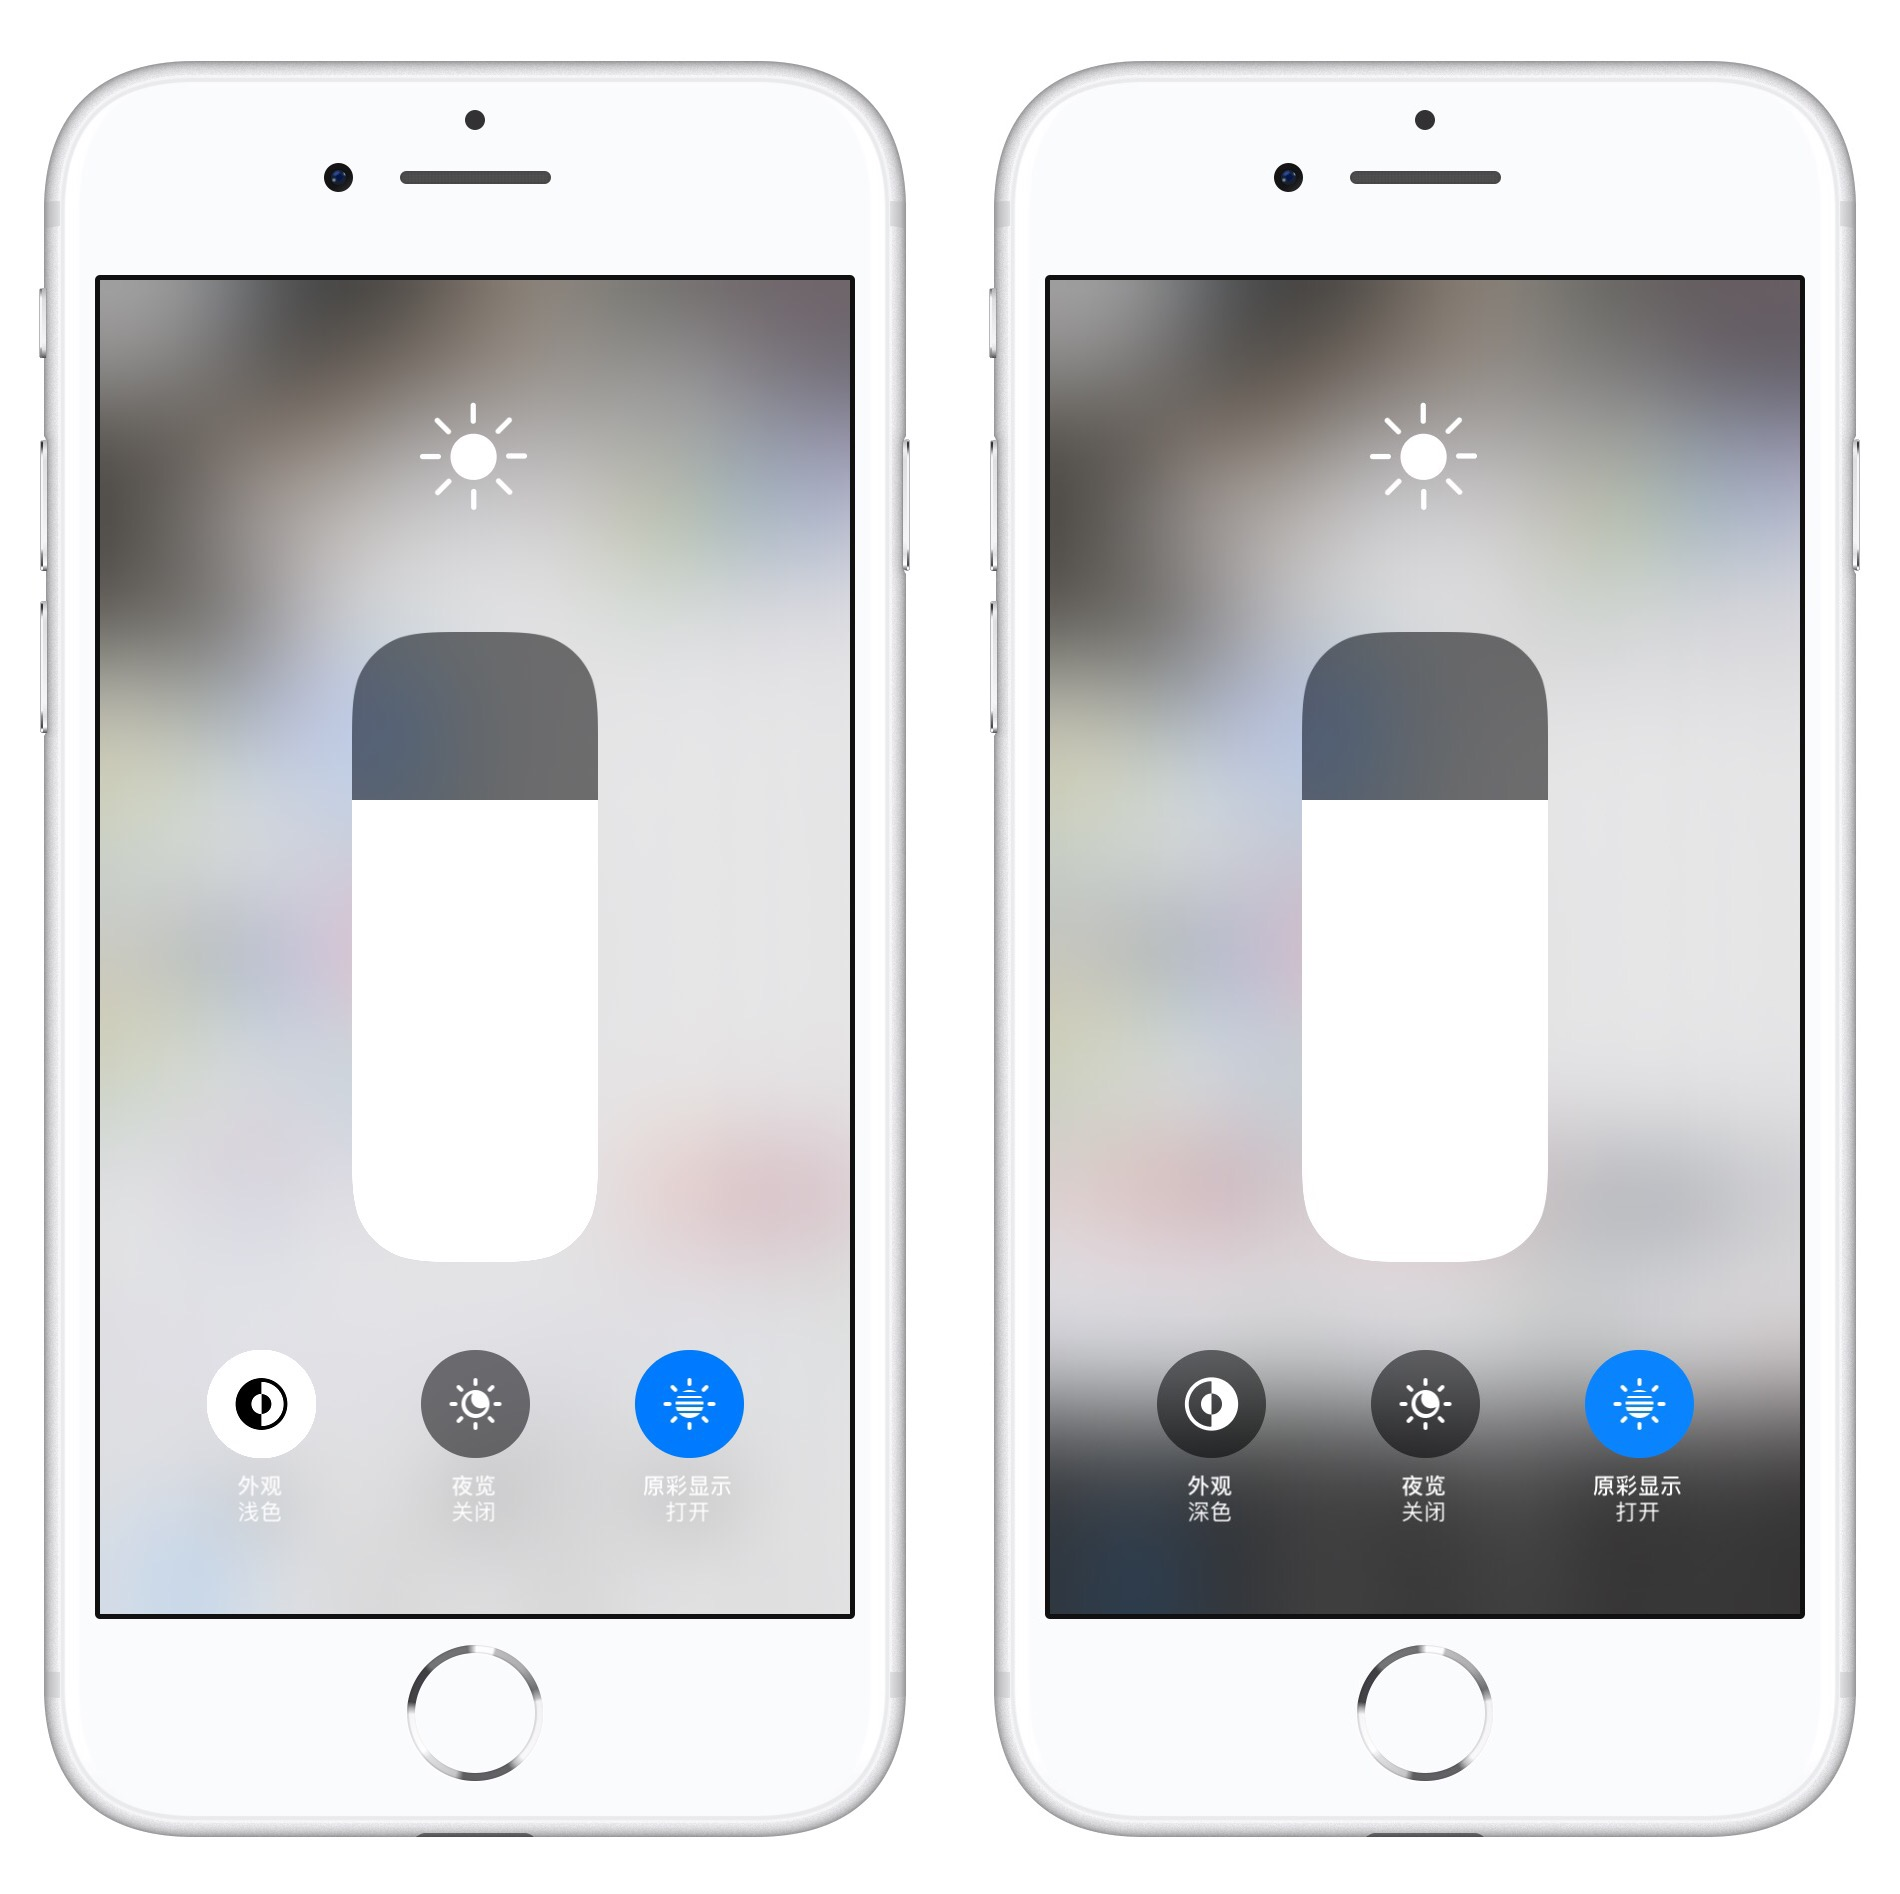 iOS 13 中「深色」外观模式的两种开启方法